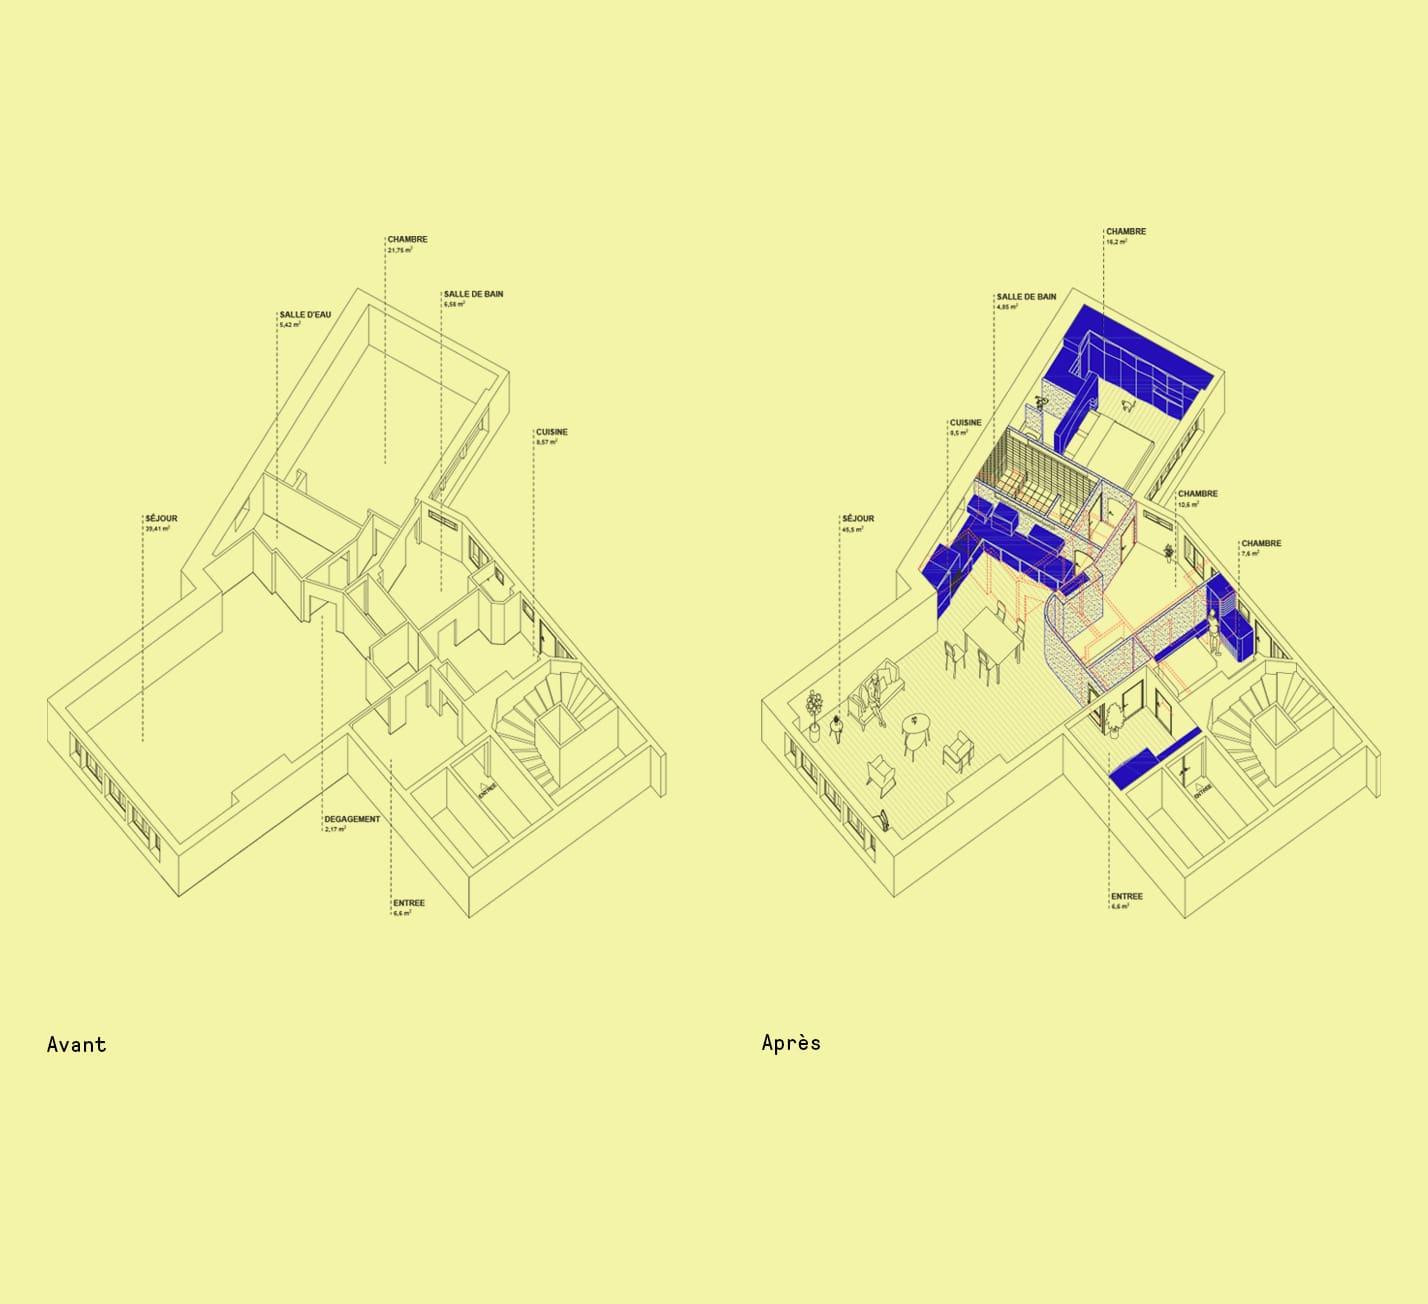 Projet-Emile-Atelier-Steve-Pauline-Borgia-Architecte-Axo-03-min